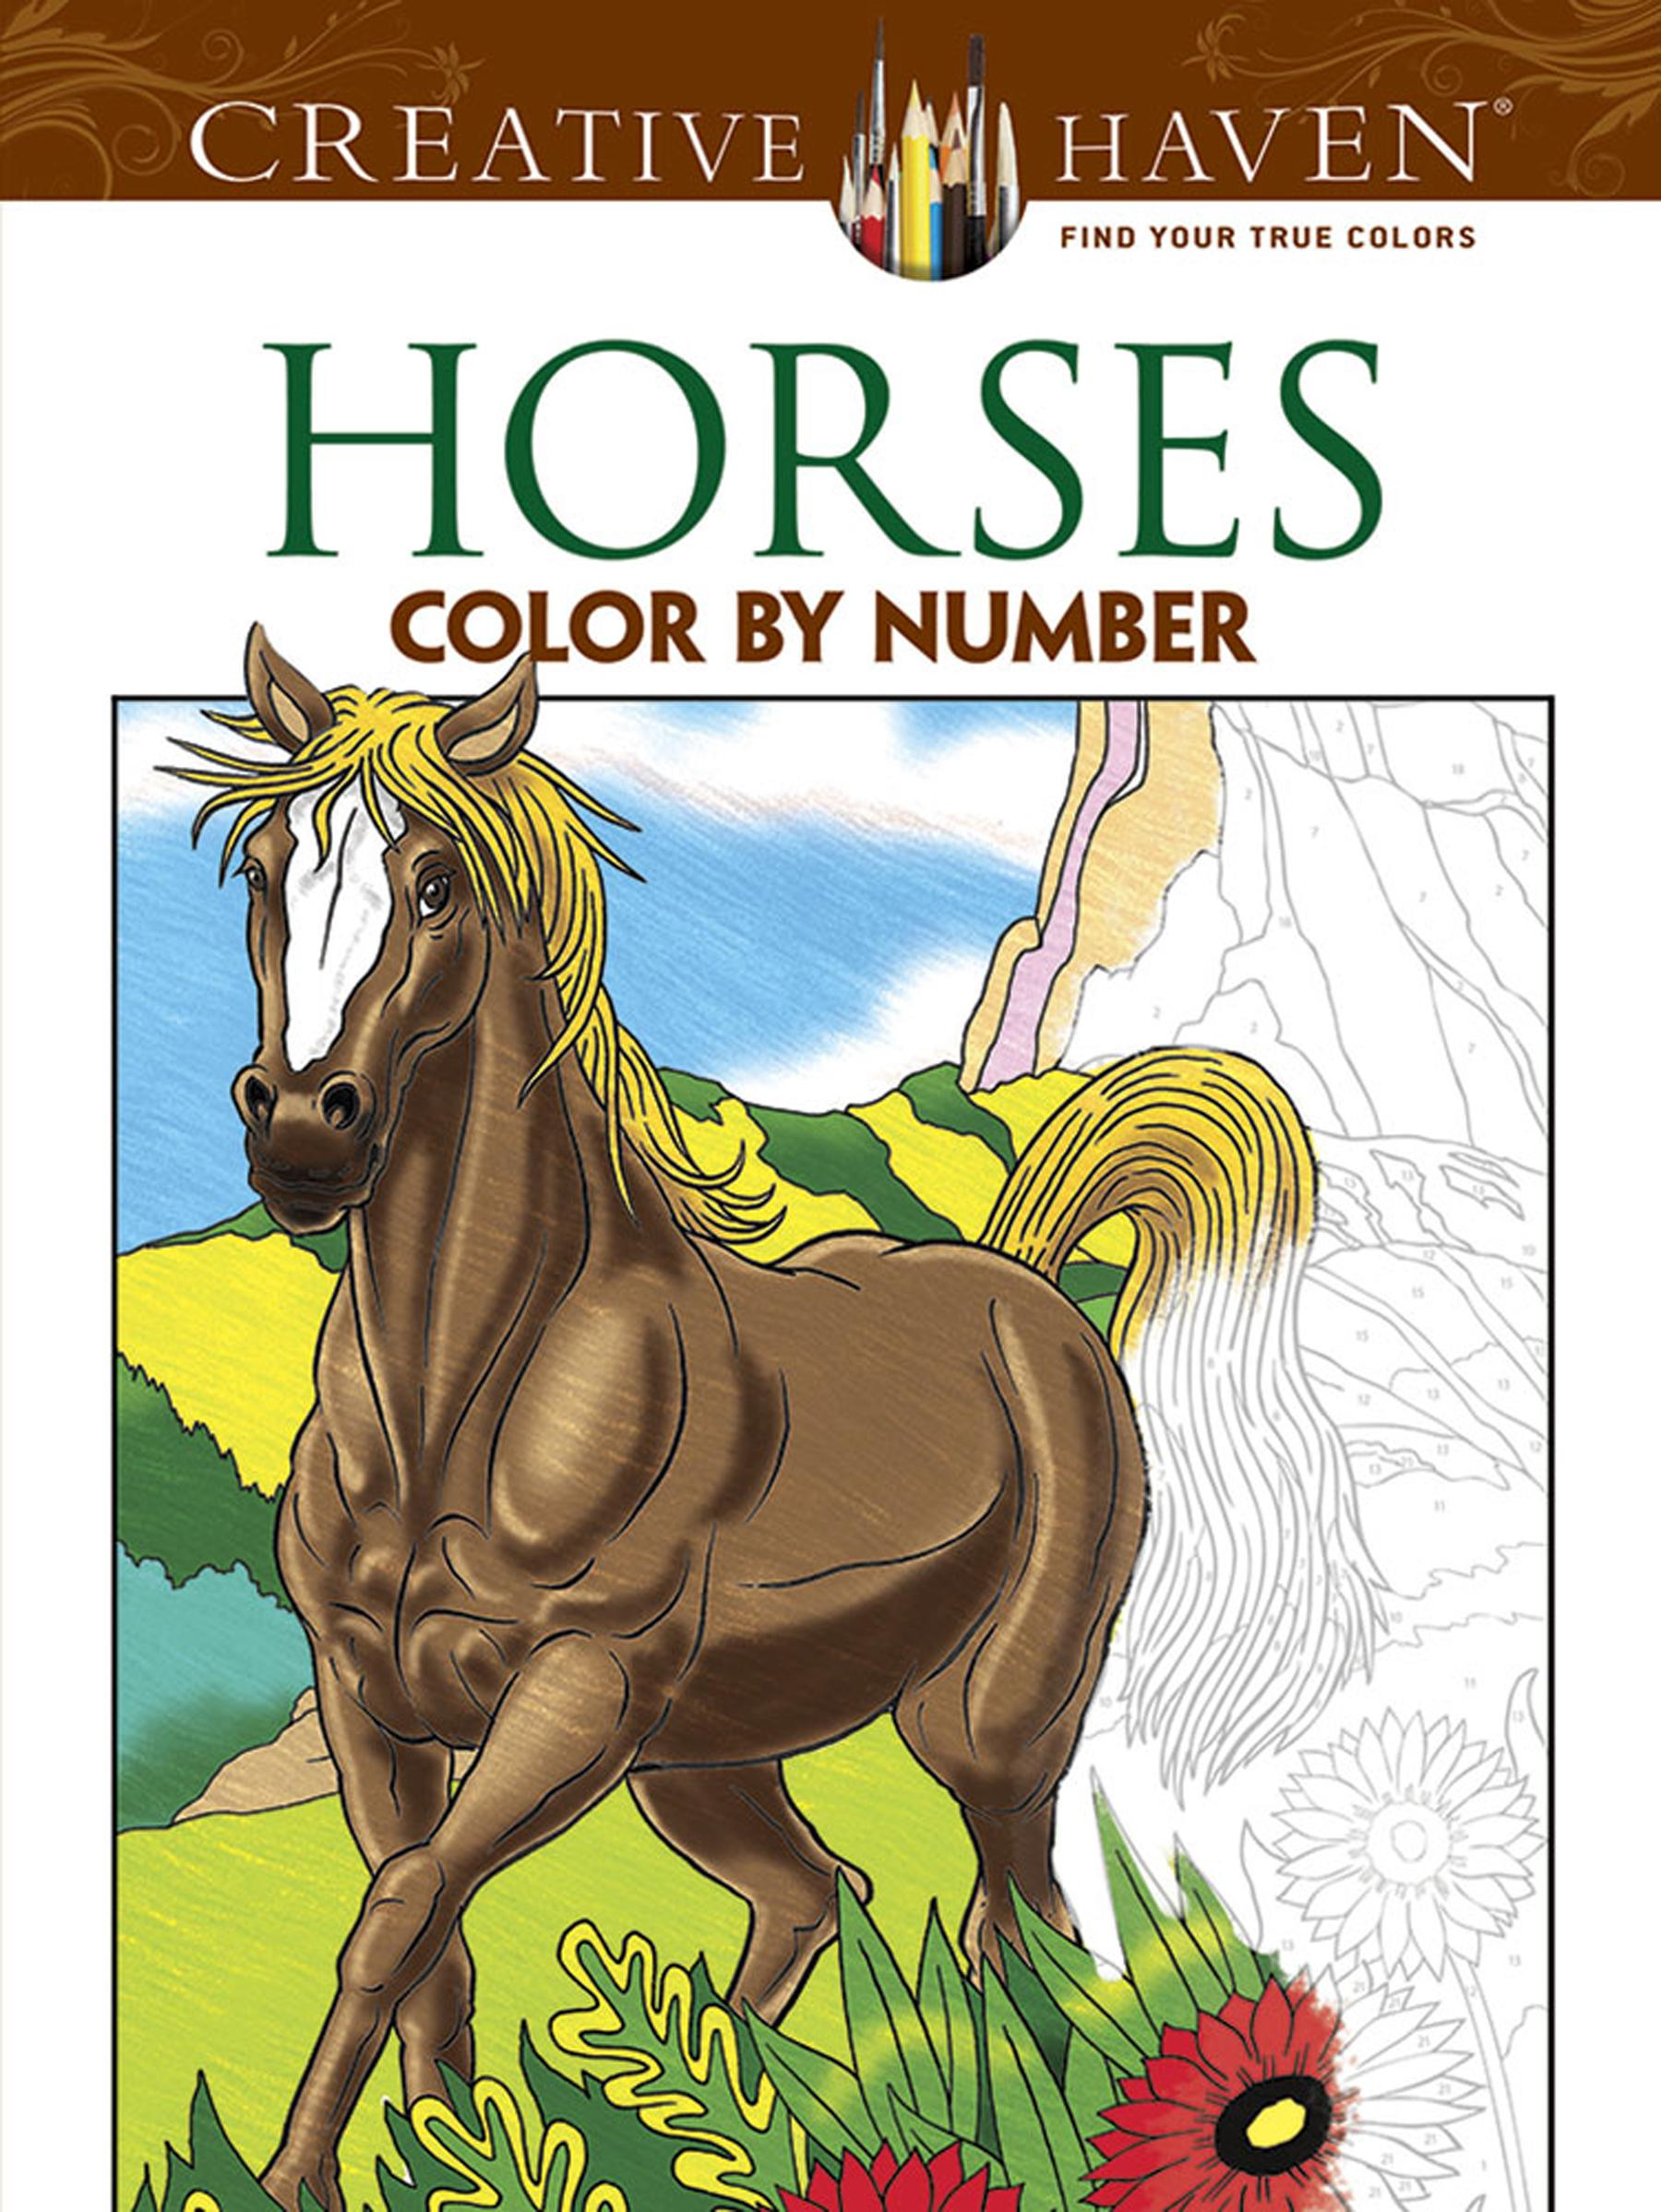 Creative Haven Coloring Books: Horses Color By Number Coloring Book  (Paperback) - Walmart.com - Walmart.com